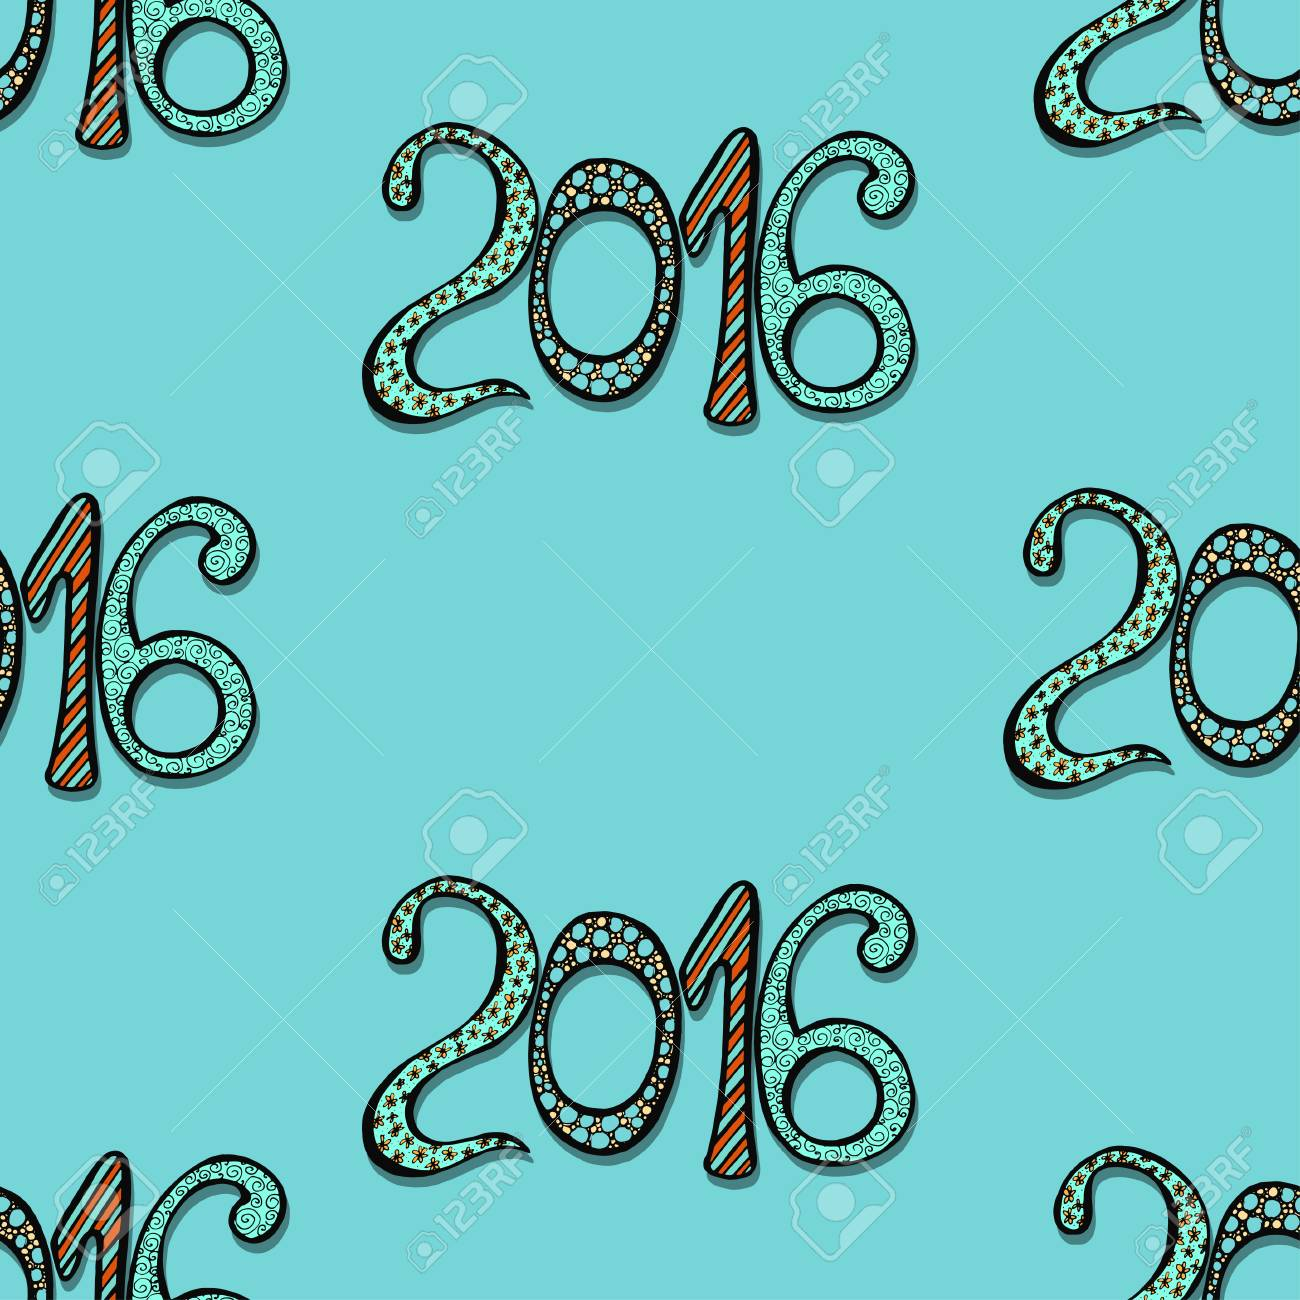 Stastny Novy Rok Pozadi S Rucne Kreslenych Cisel Royalty Free